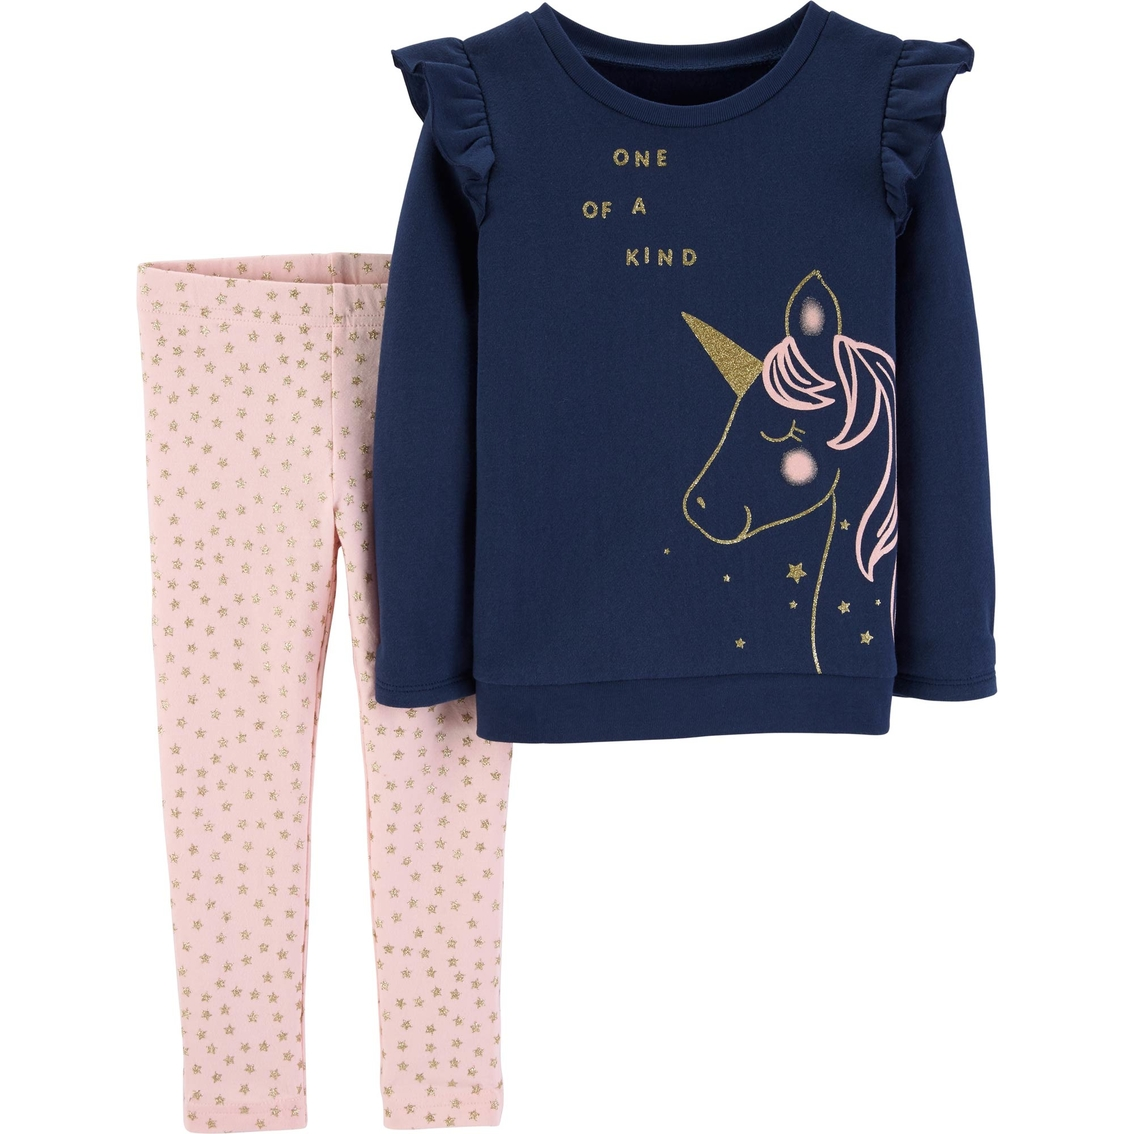 06f2a7aa7a38a Carter's Toddler Girls 2 pc. Unicorn Fleece Top and Star Leggings Set